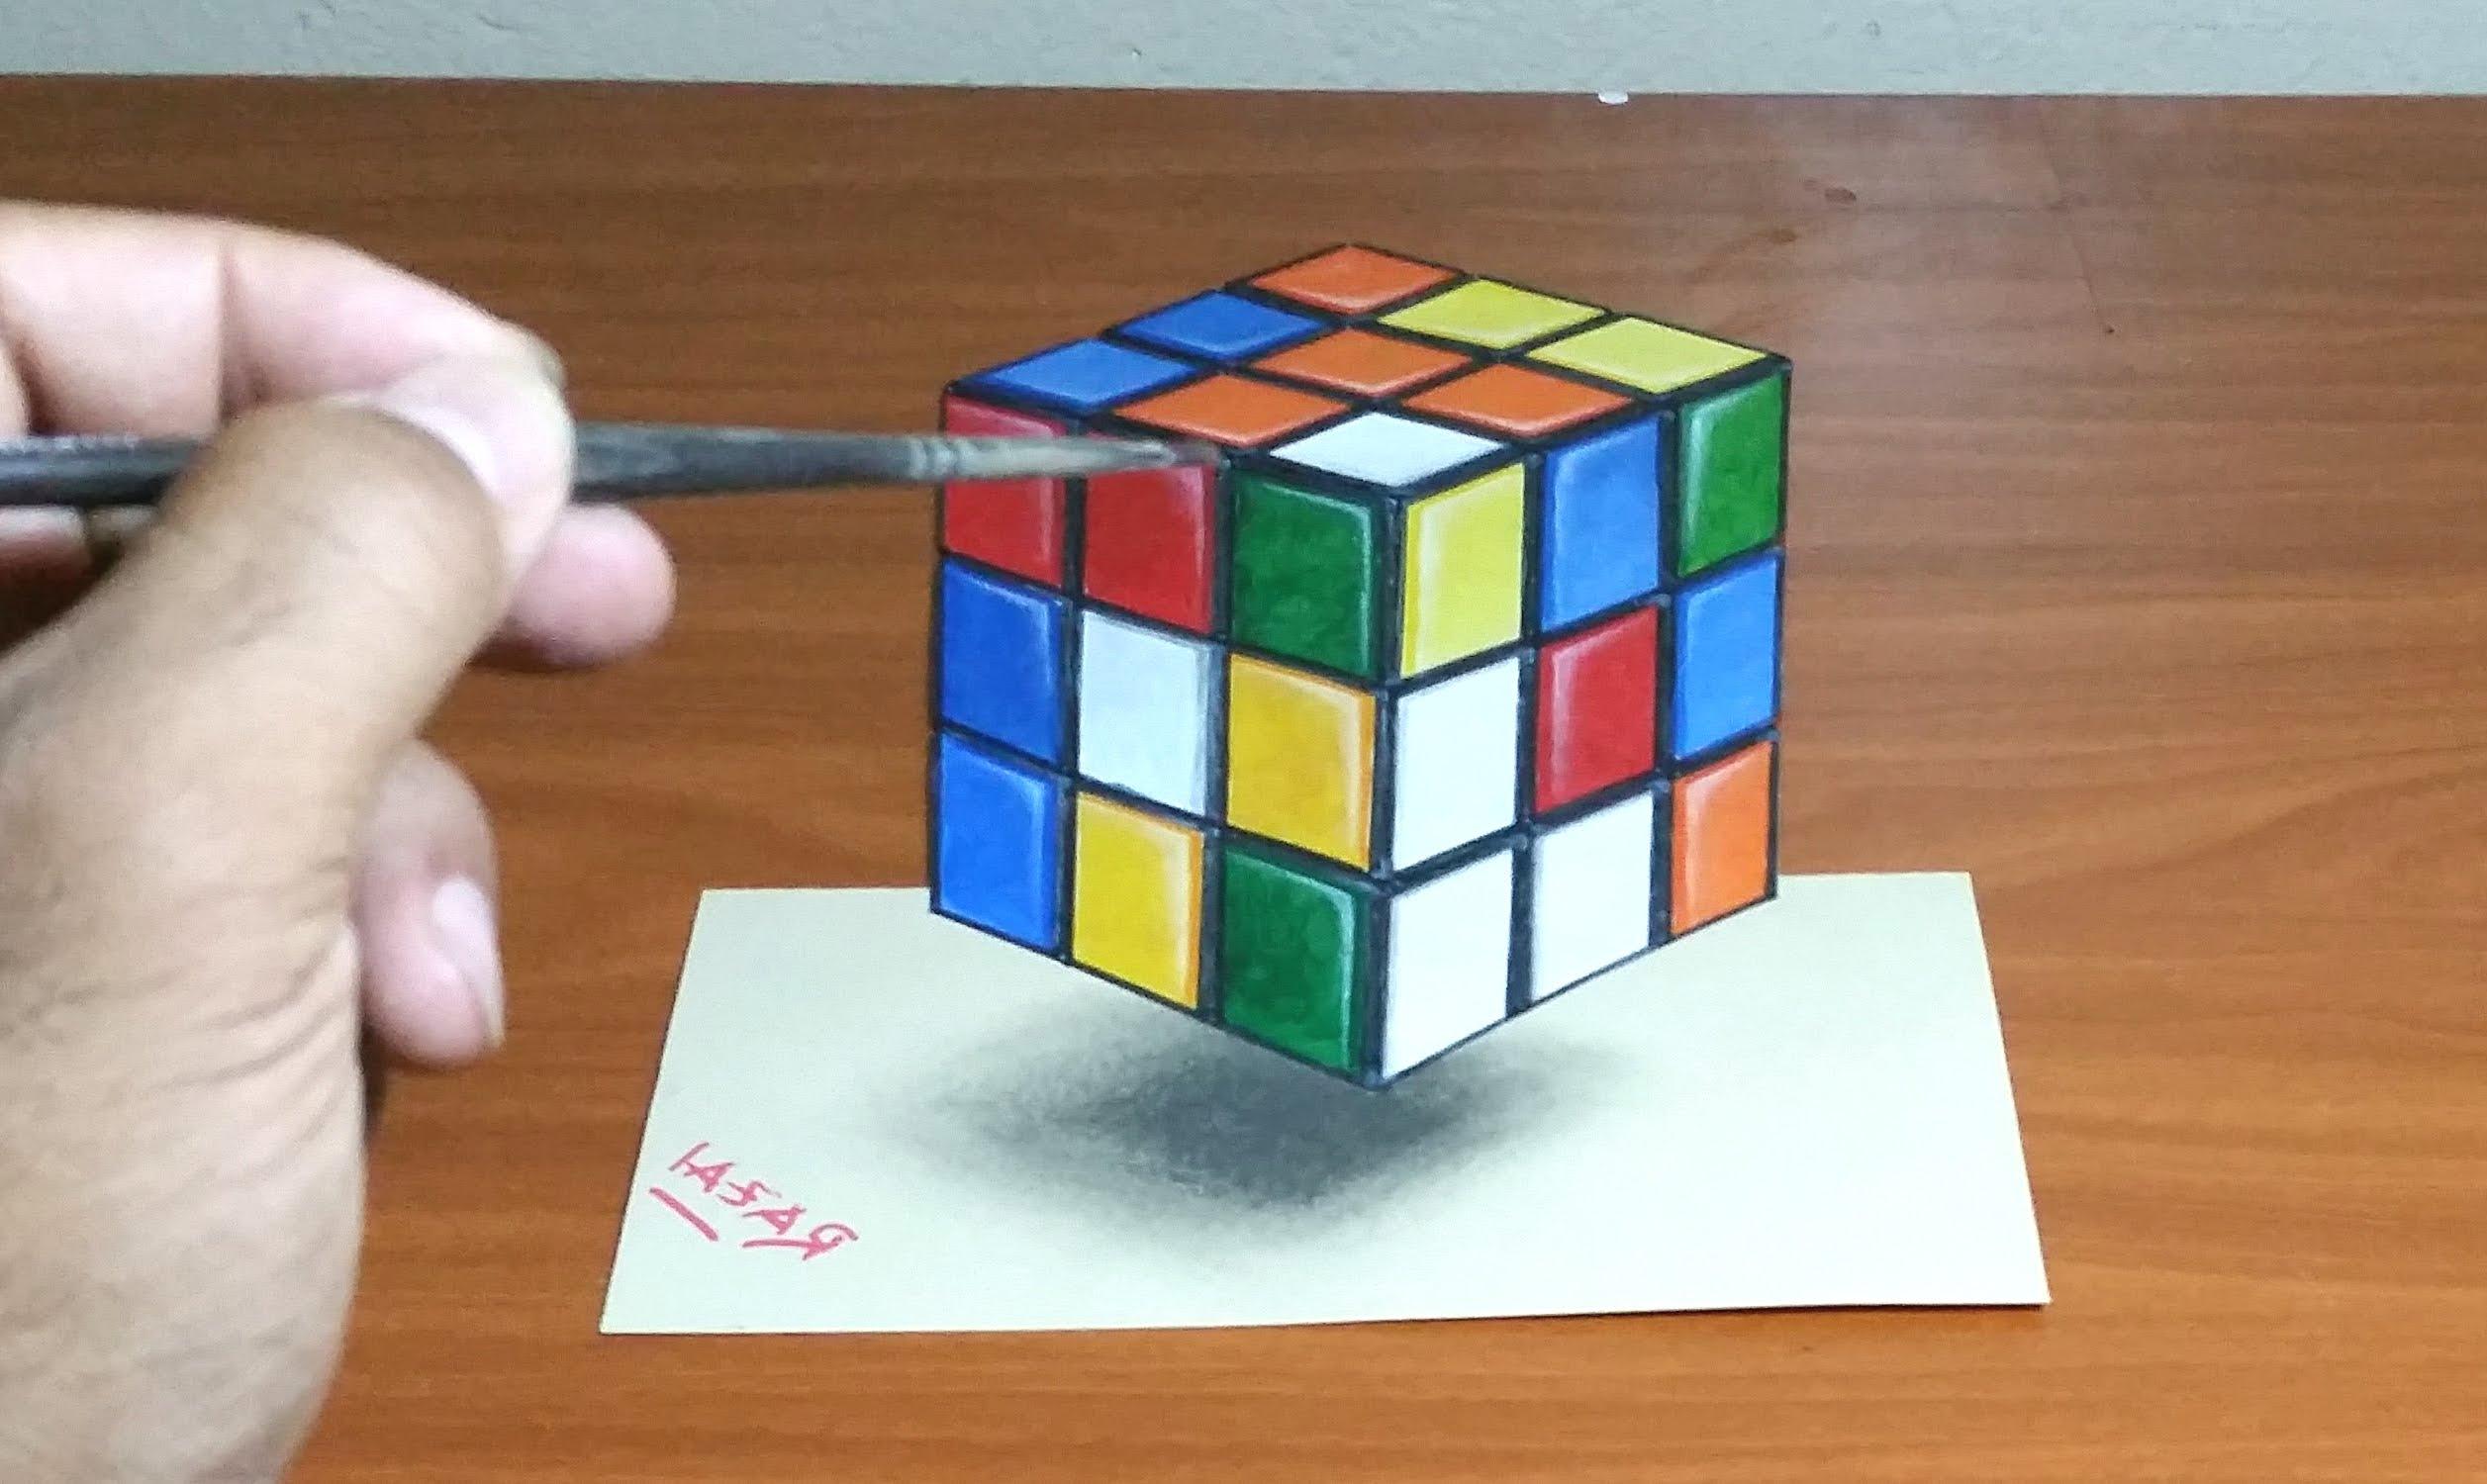 Drawn optical illusion 0ptical NEW HD Illusions Compilation